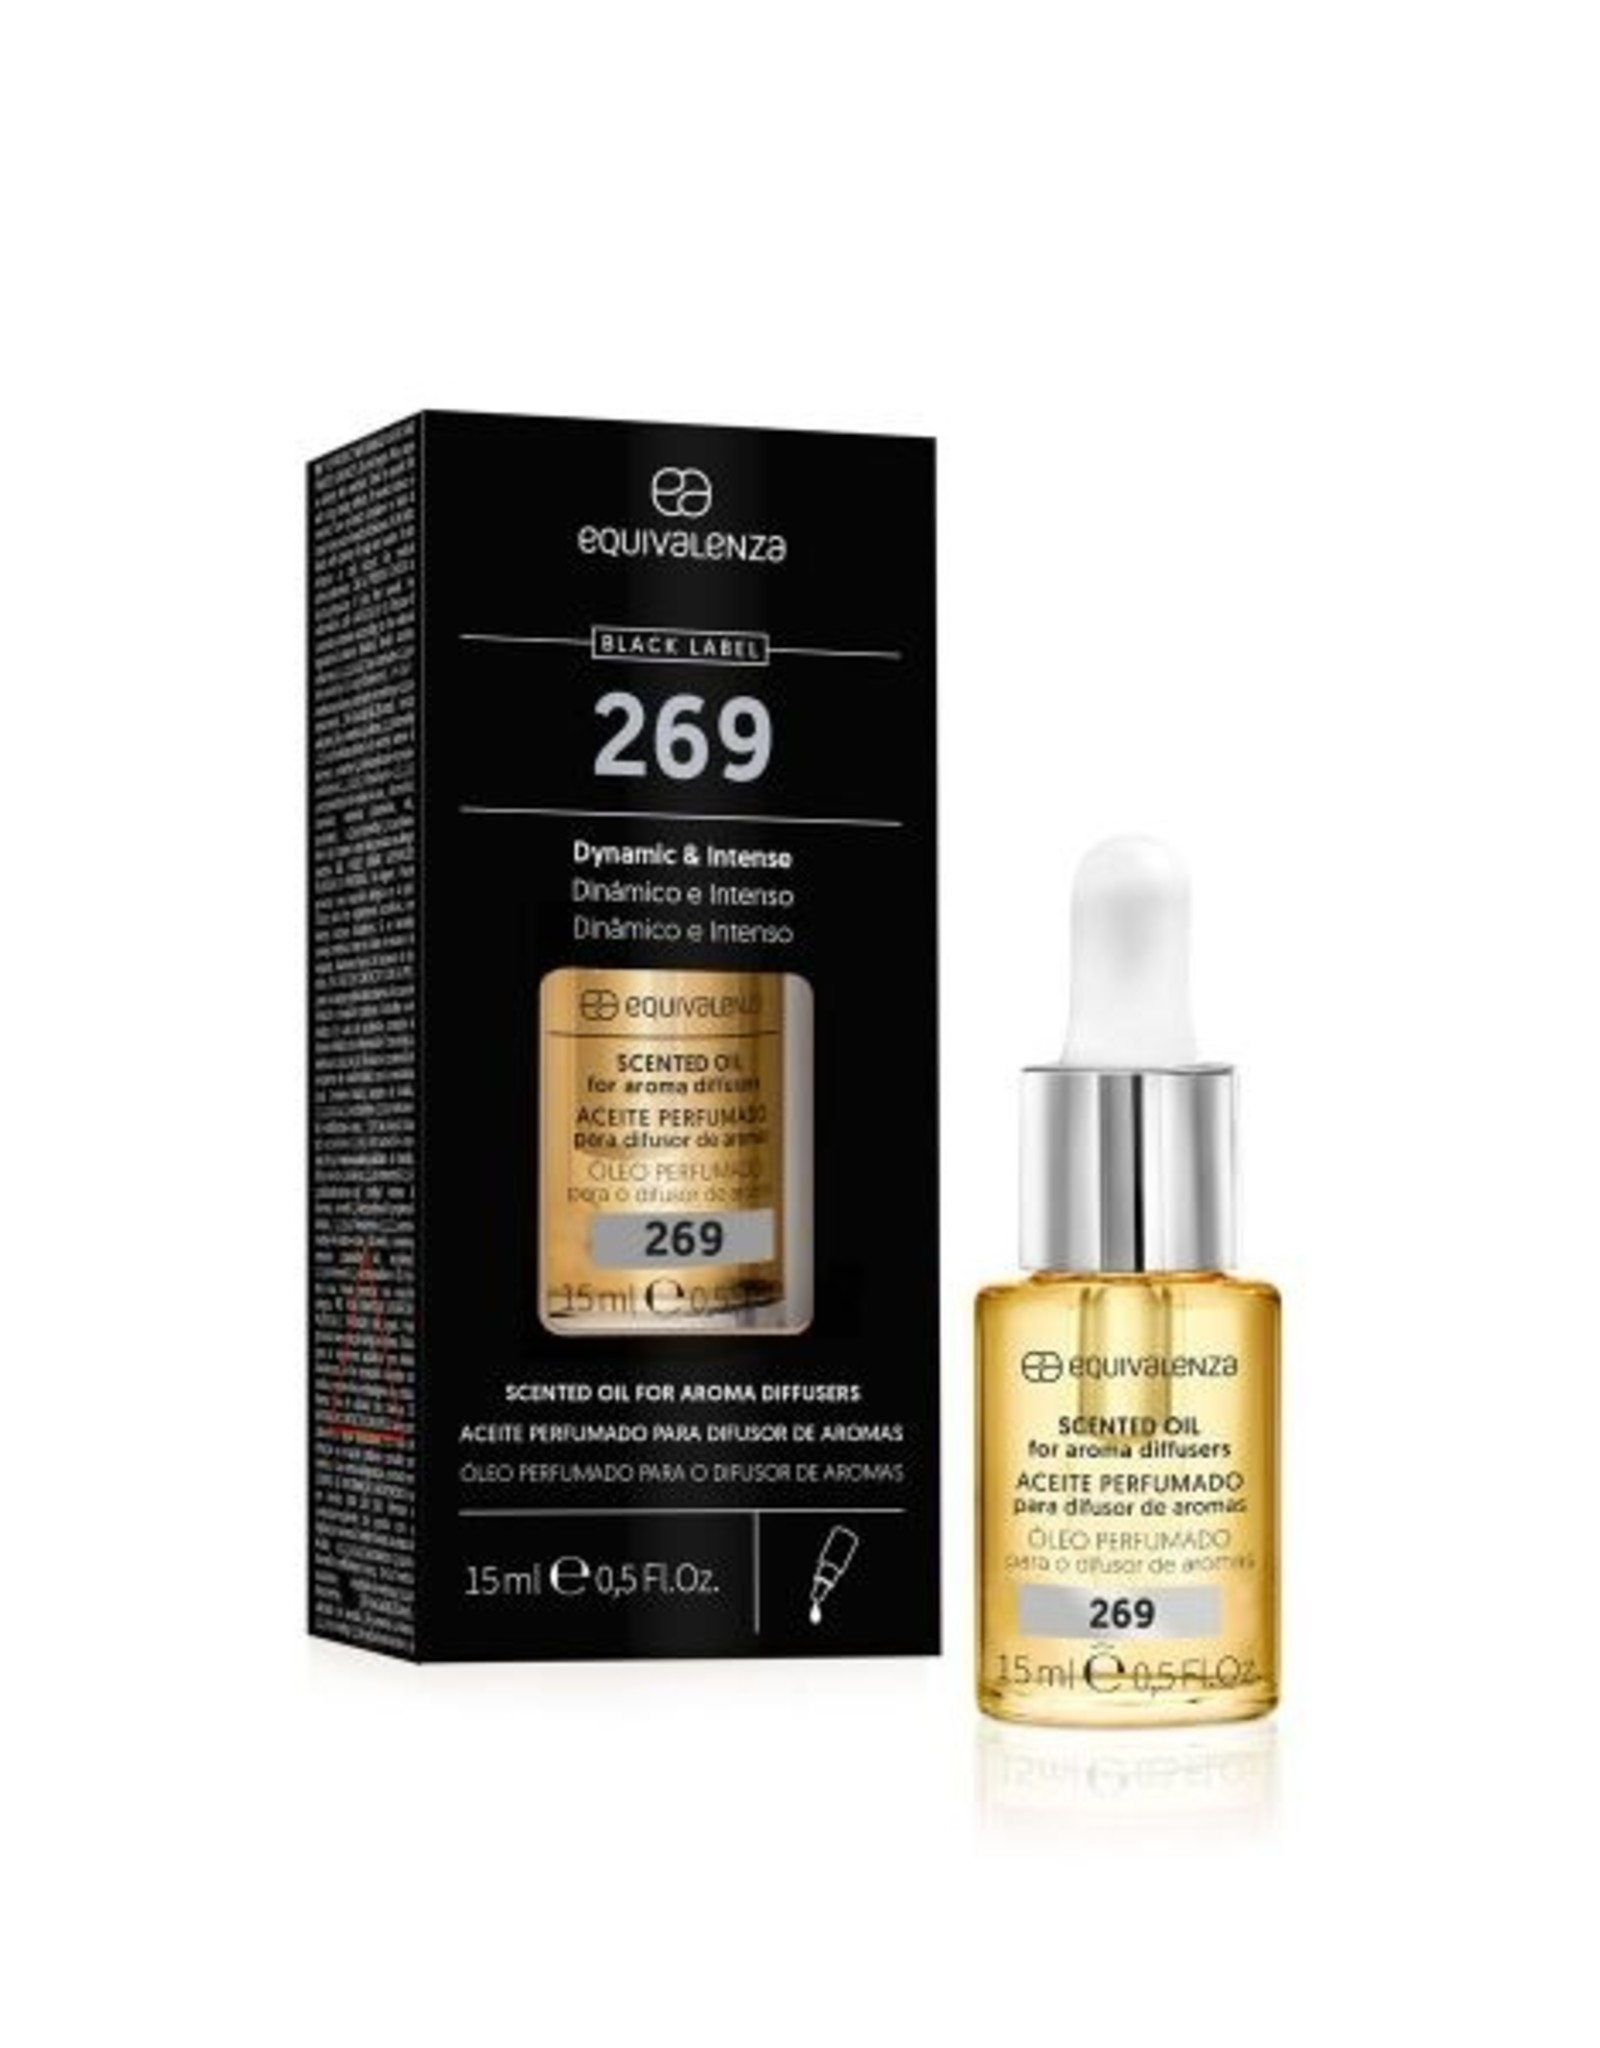 Equivalenza Huile Parfumée Hydrosoluble – Black Label nº 269